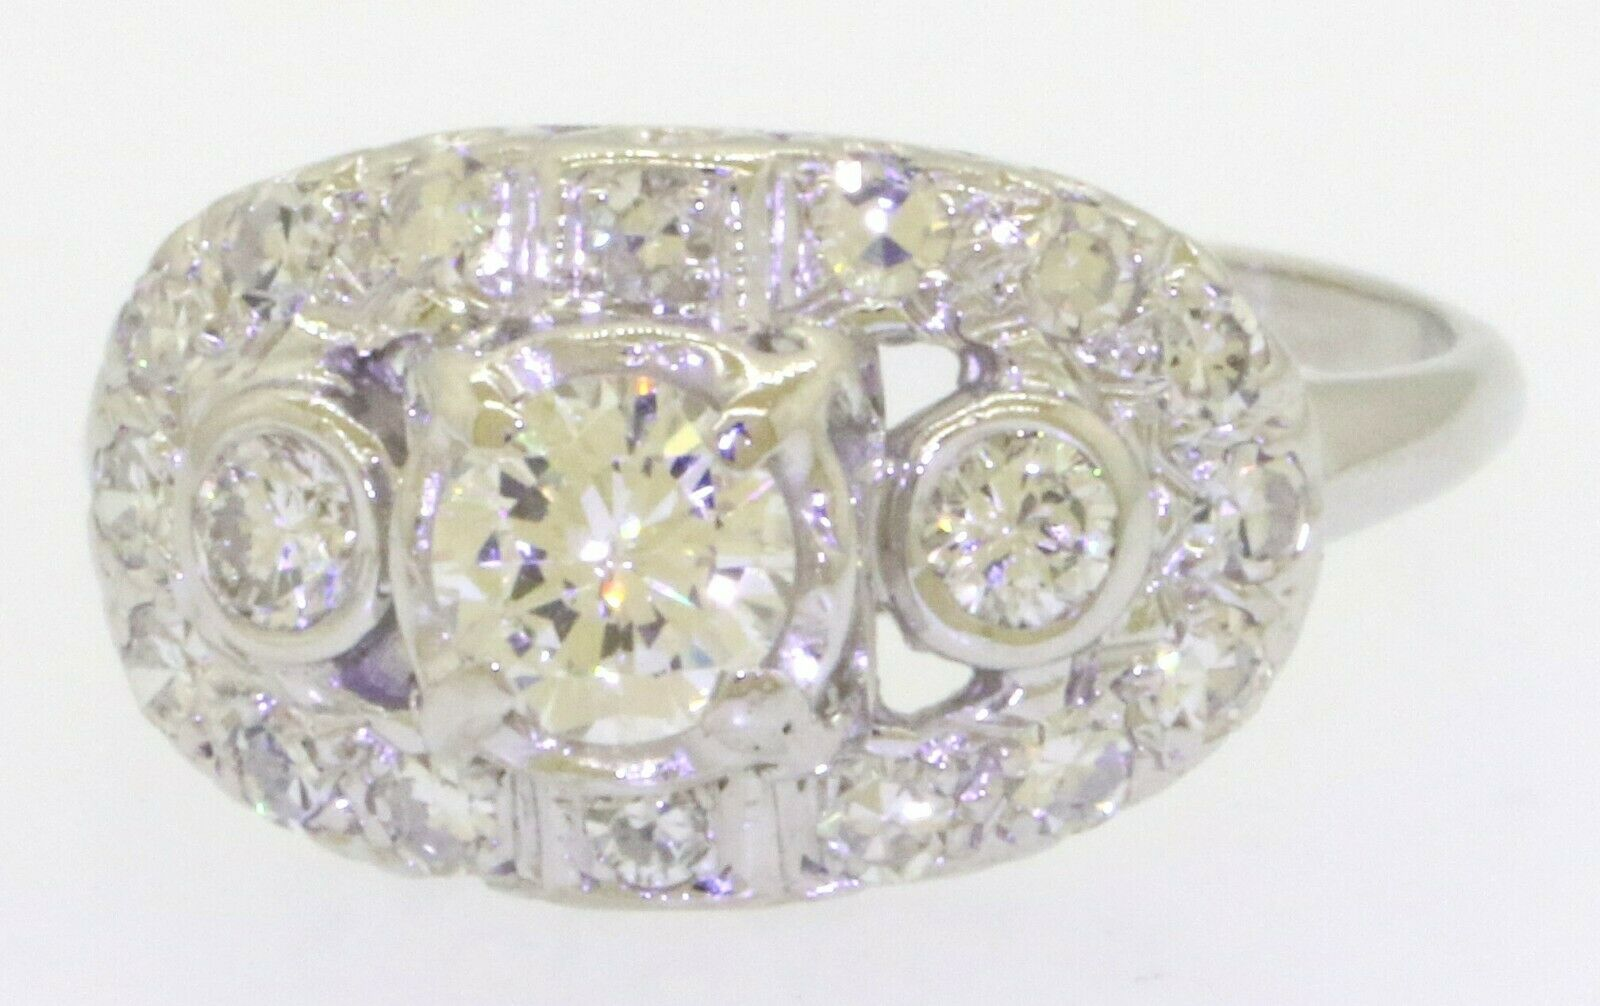 Antique 14K WG 1.16CTW VS diamond wedding/engagement ring w/.50CT ctr. size 7.75